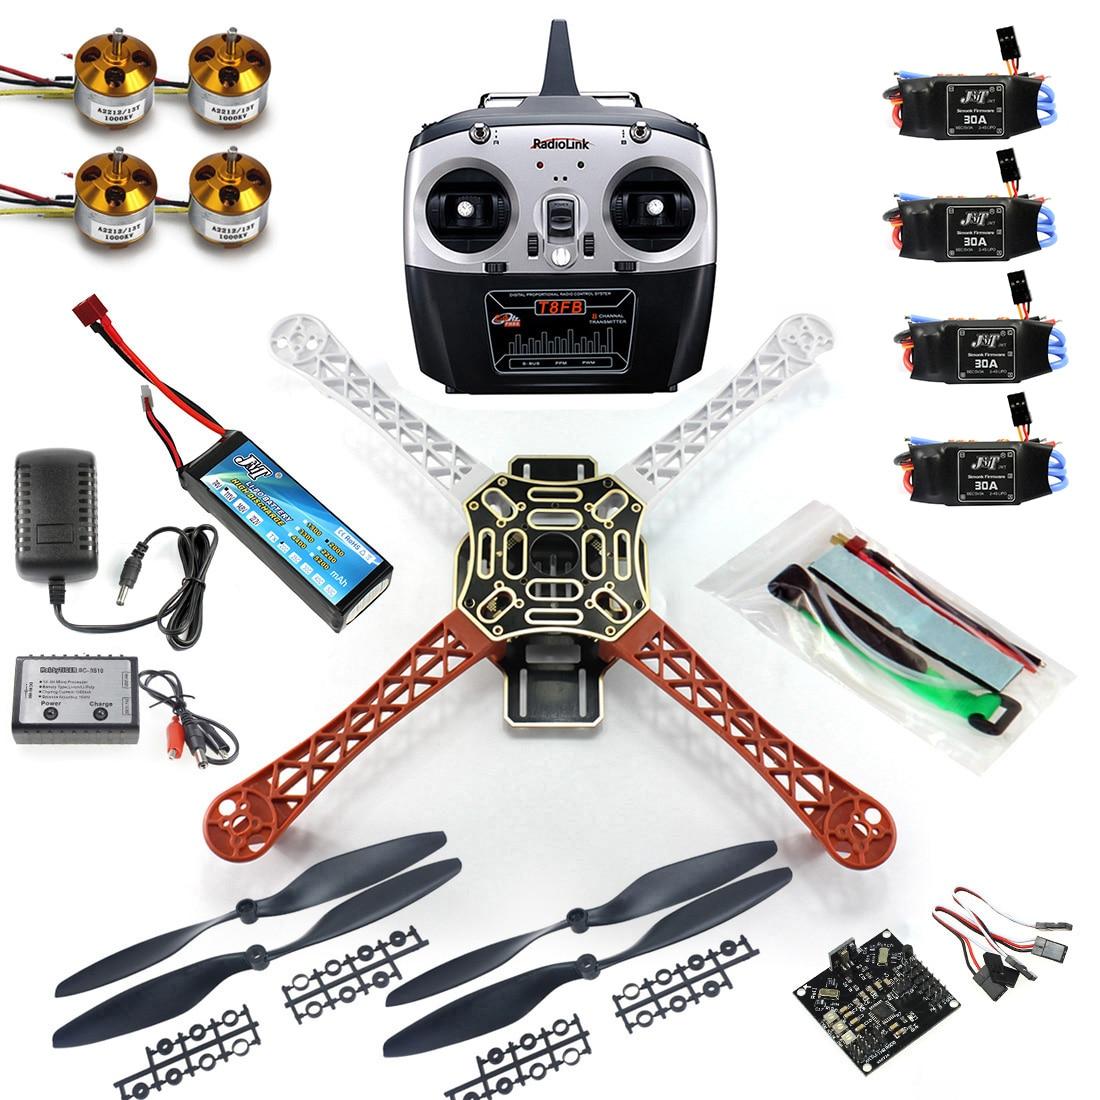 F02192-A RC Multi QuadCopter UFO RTF/ARFKK V2.3 Circuit board+1000KV Motor+30A ESC+Lipo+F450 Flamewheel+6ch TX&RX F02192-A RC Multi QuadCopter UFO RTF/ARFKK V2.3 Circuit board+1000KV Motor+30A ESC+Lipo+F450 Flamewheel+6ch TX&RX